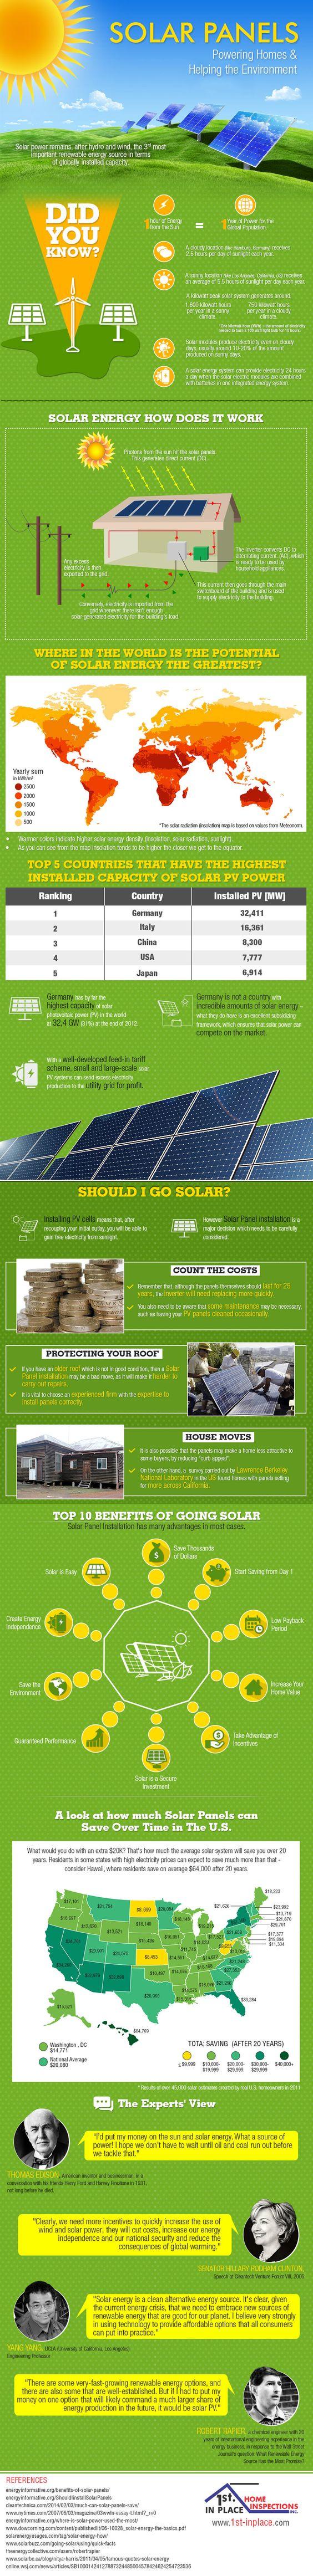 benefits of renewable energy essay